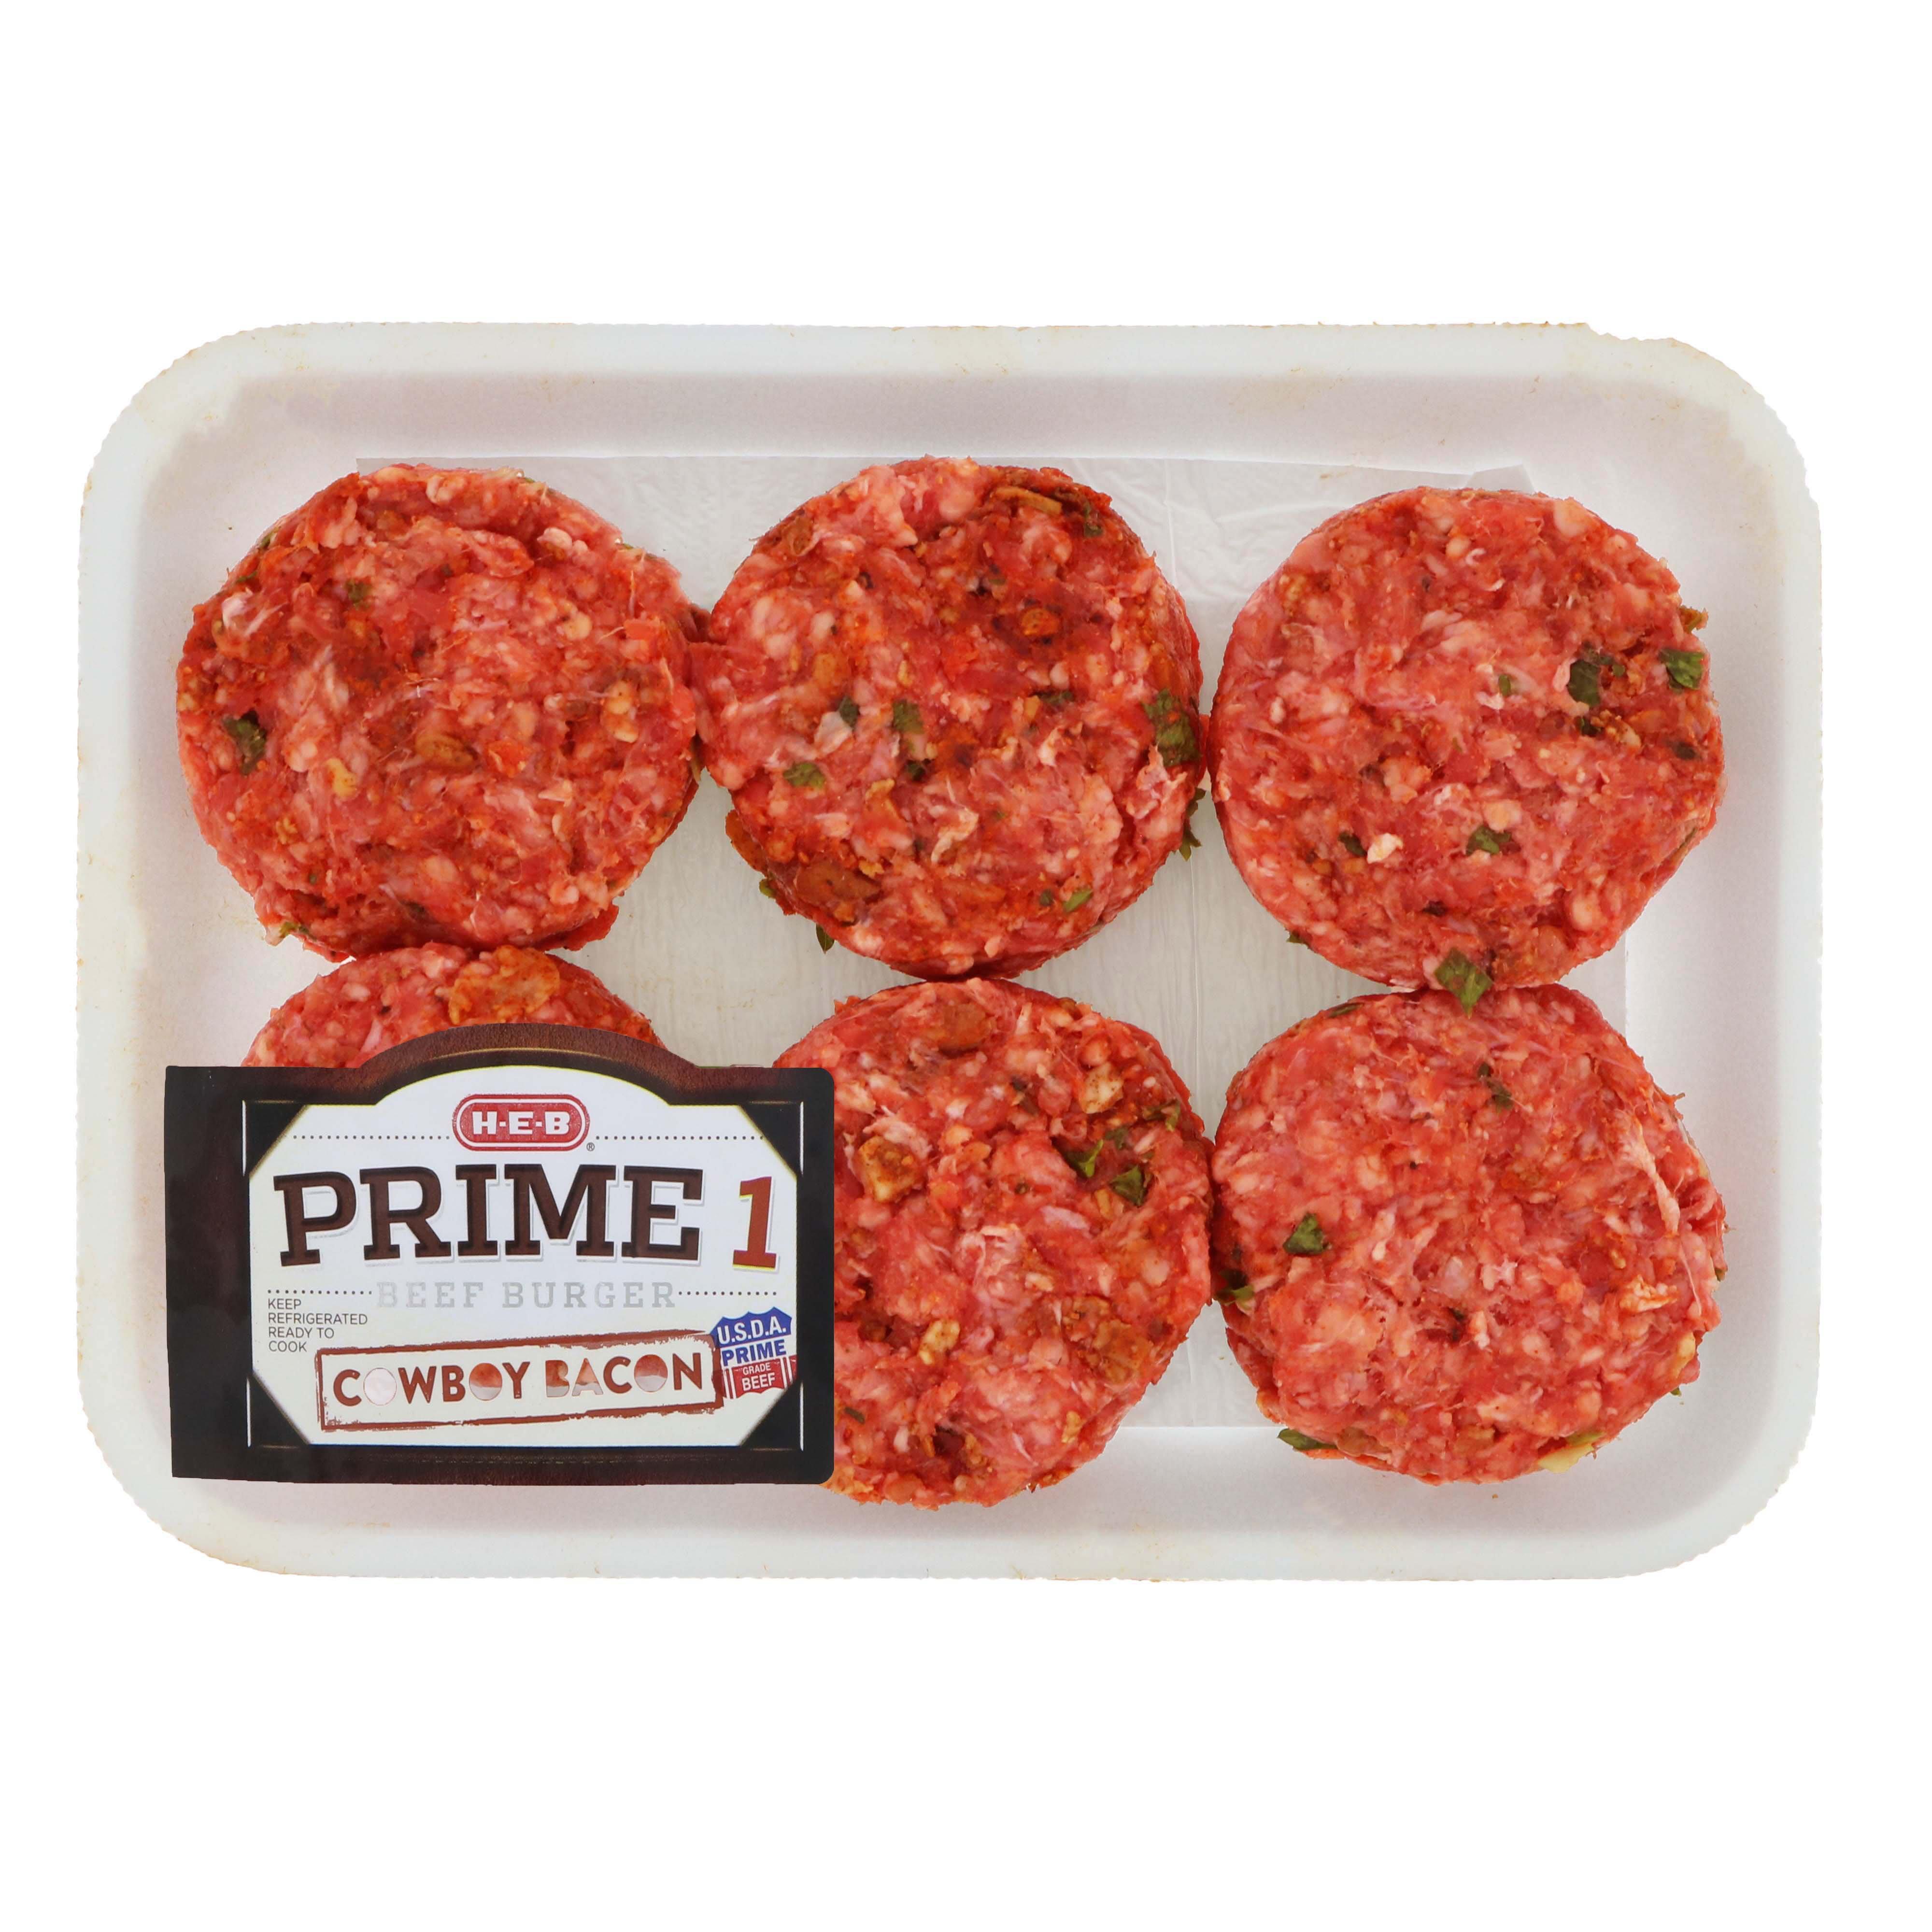 H E B Prime 1 Cowboy Beef Sliders